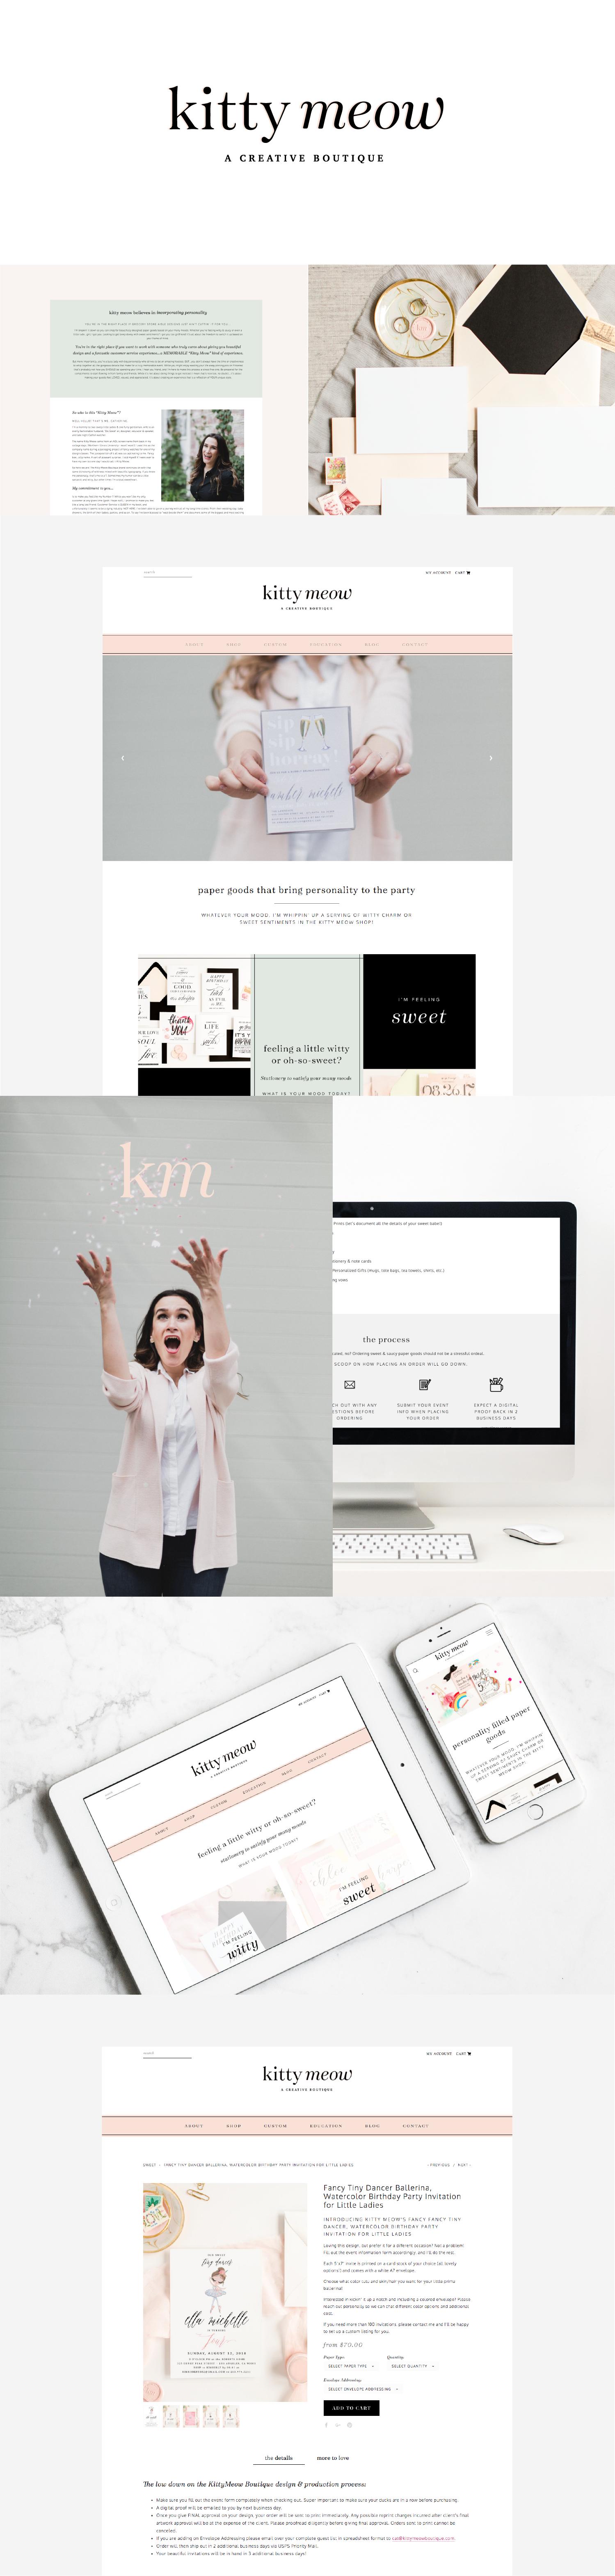 Website and Commerce Design + Development